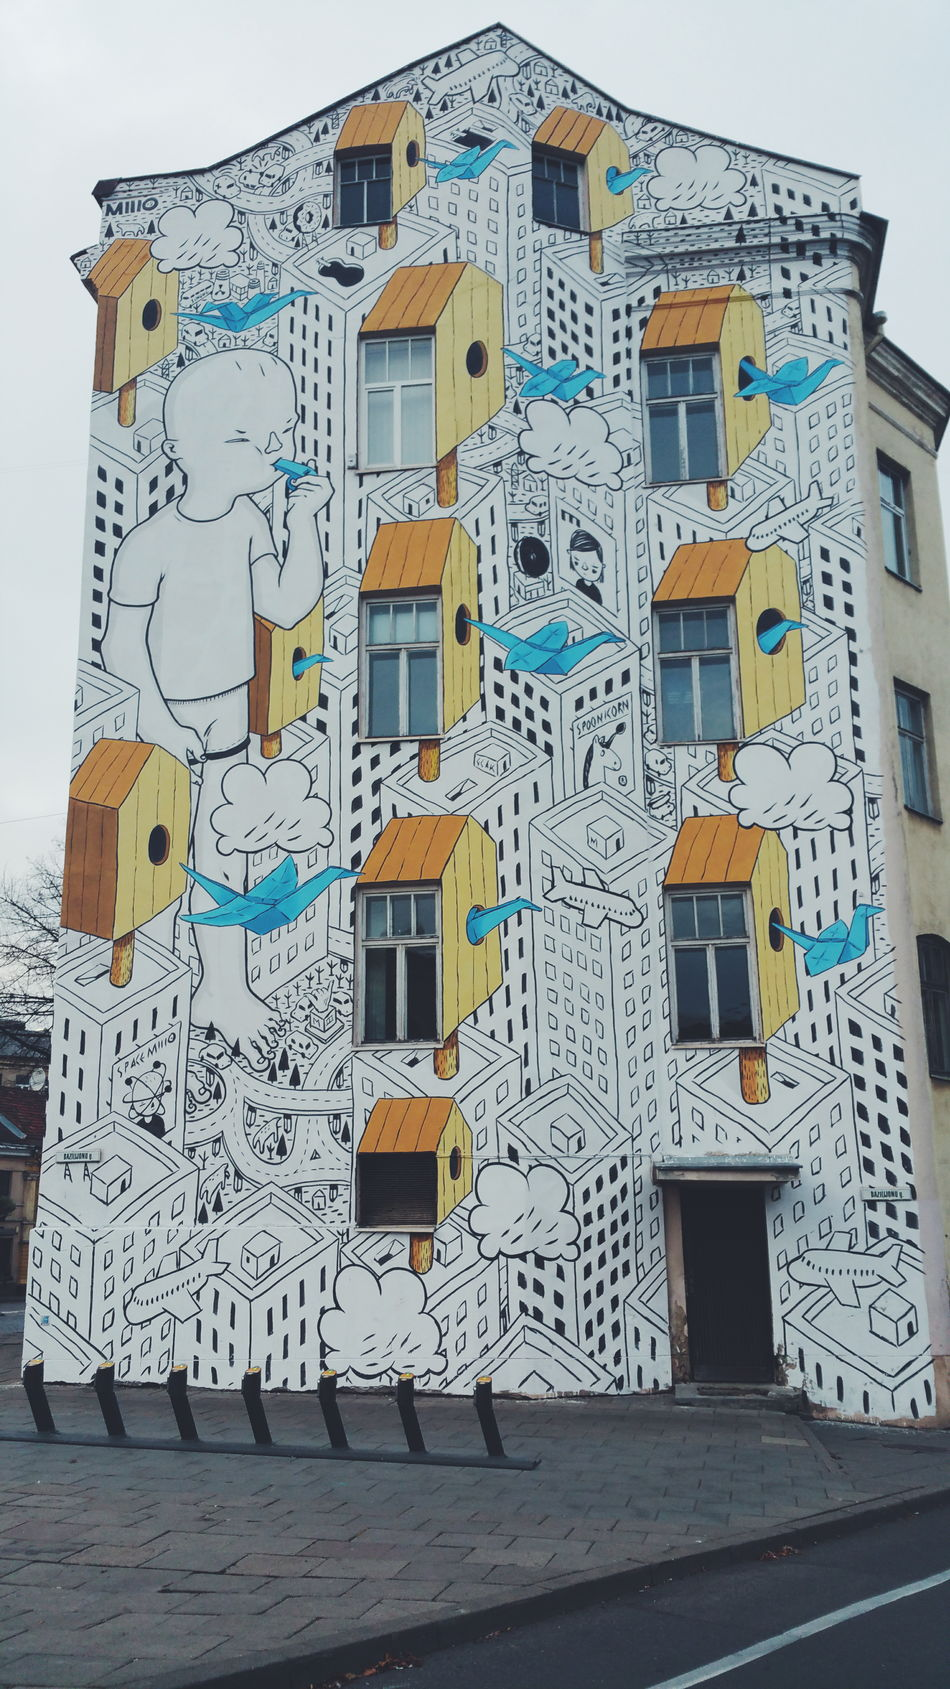 Vilnius City Vilnius Street Art Lithuania Wall Art Wall Painting Yellow Samsung Galaxy Note 4